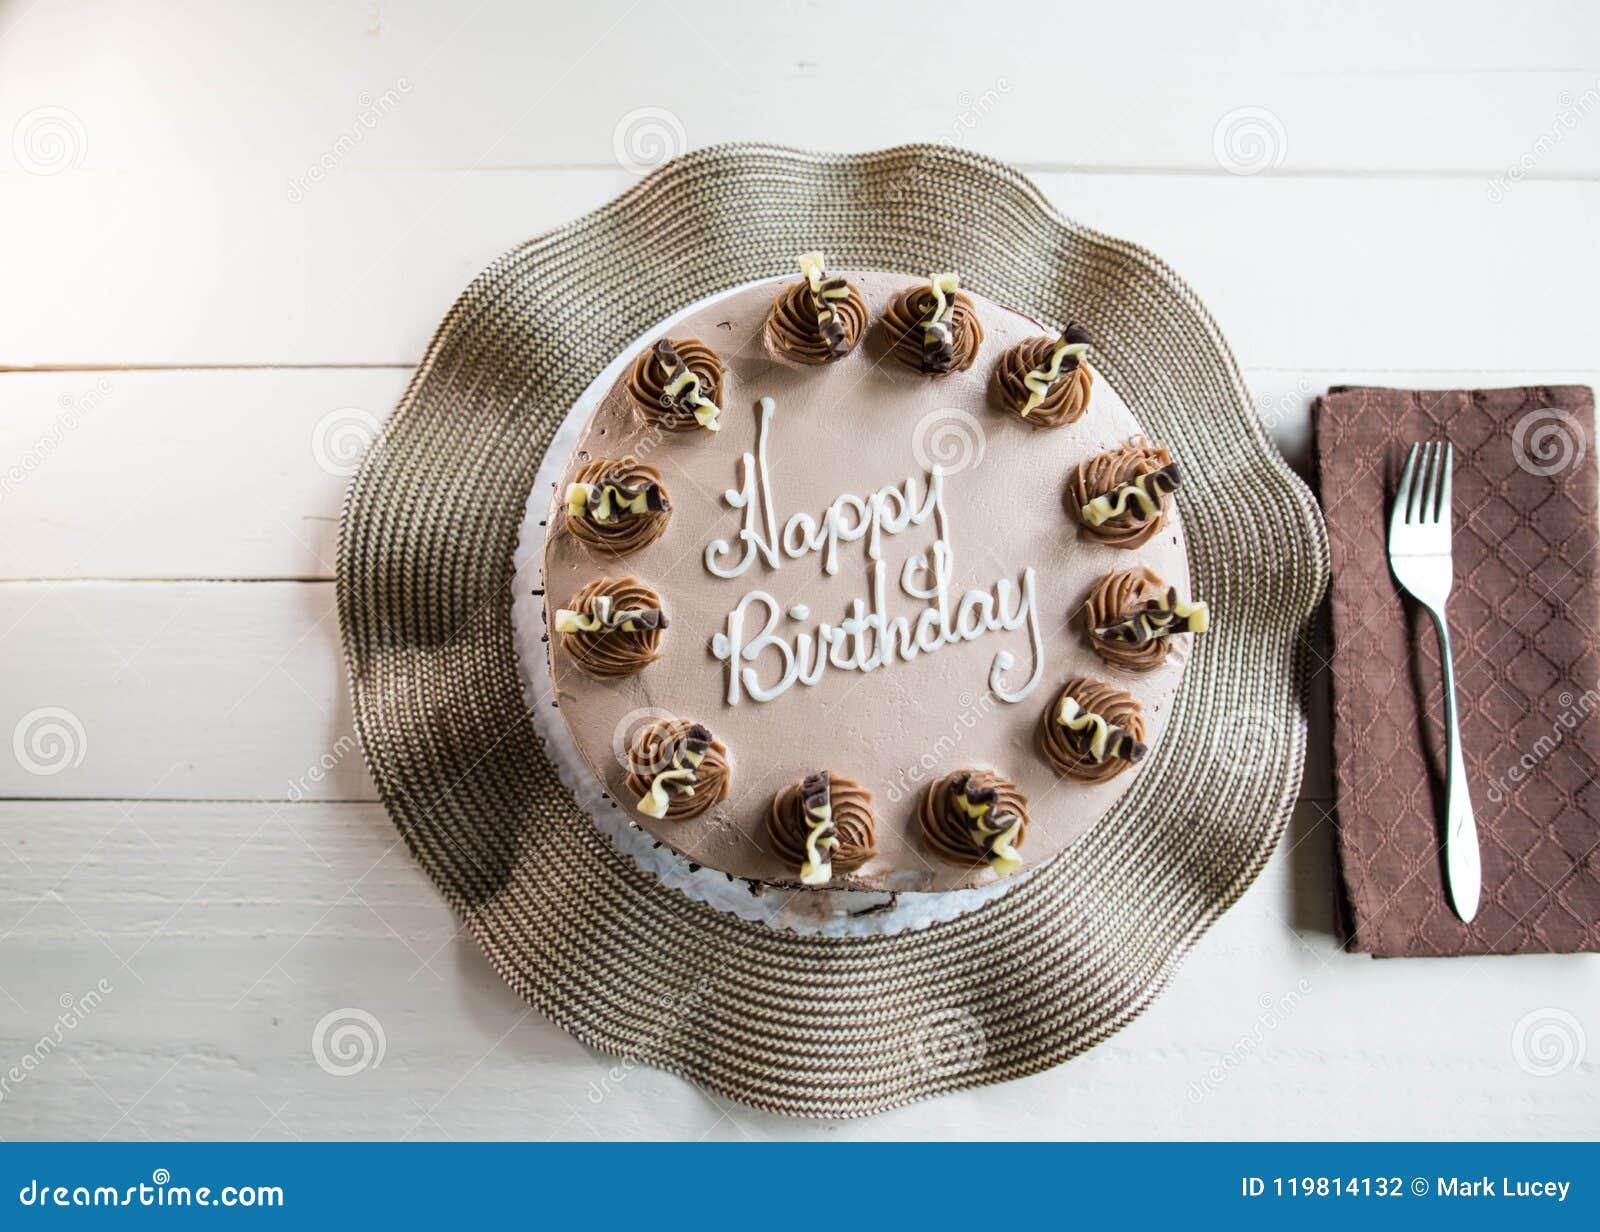 Chocolate Fancy Birthday Cake Stock Photo Image Of Cream Event